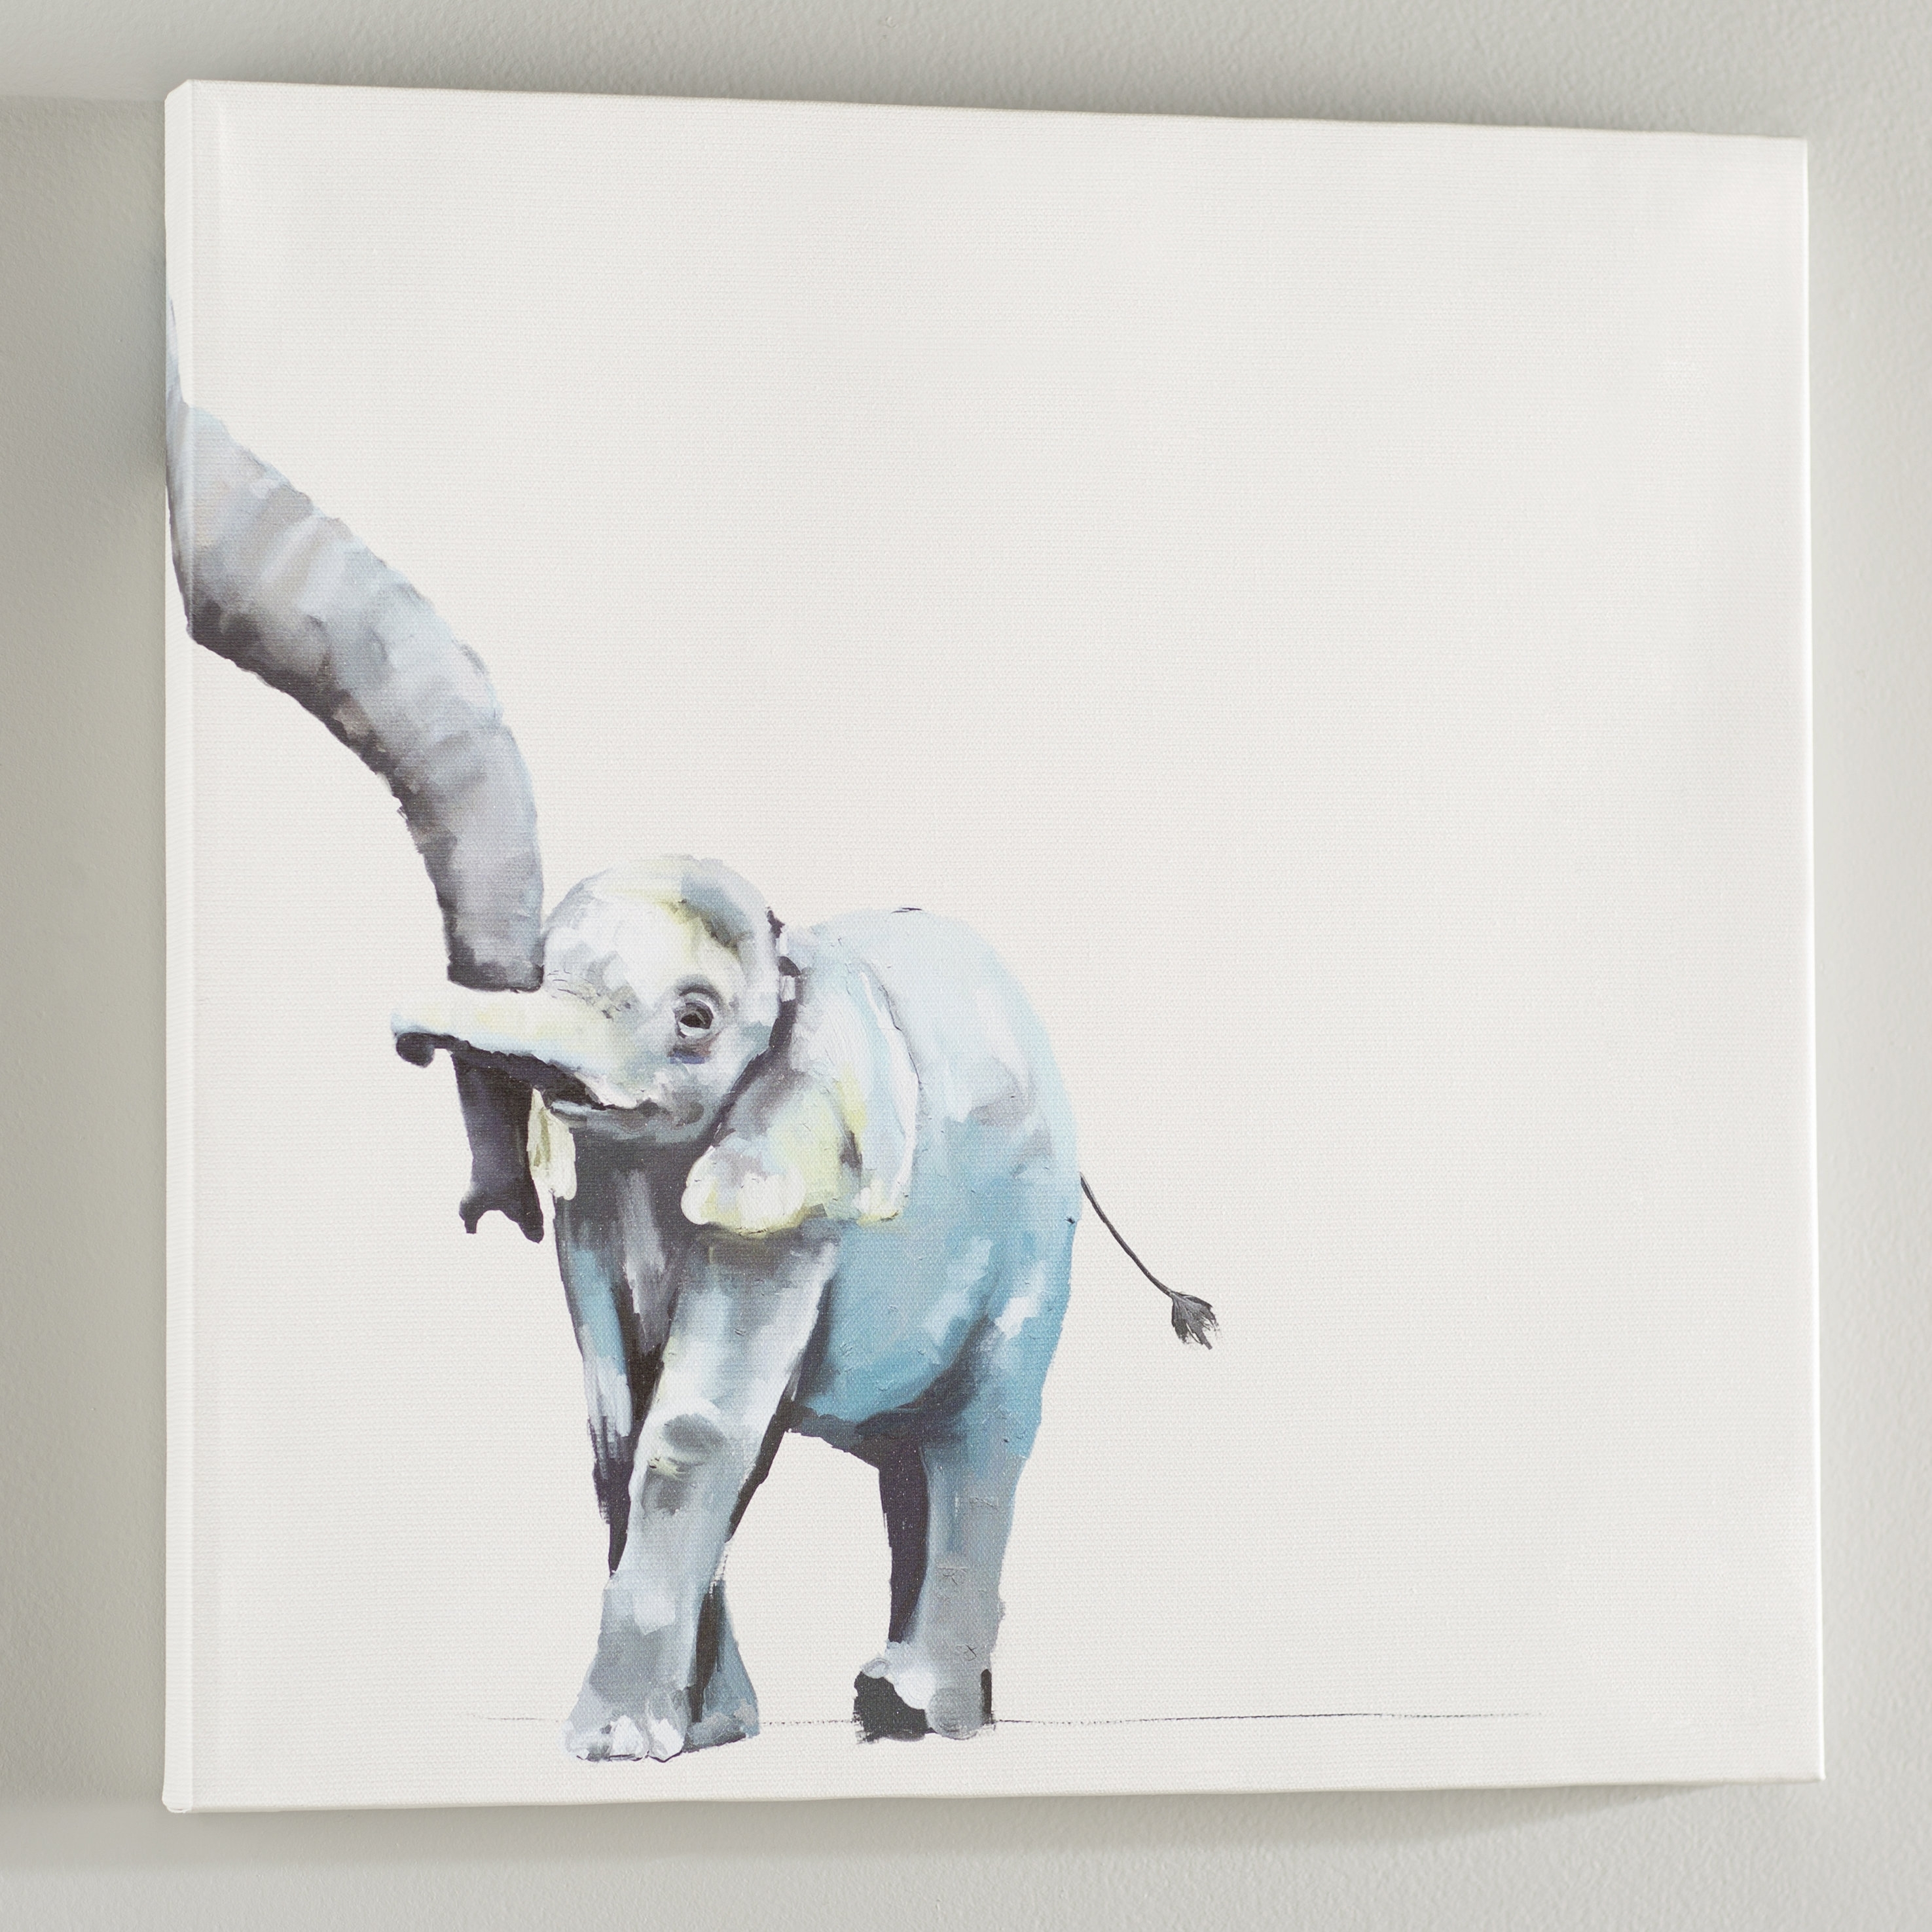 Viv + Rae Frankie You And Me Elephant Canvas Wall Art | Wayfair intended for Elephant Canvas Wall Art (Image 20 of 20)